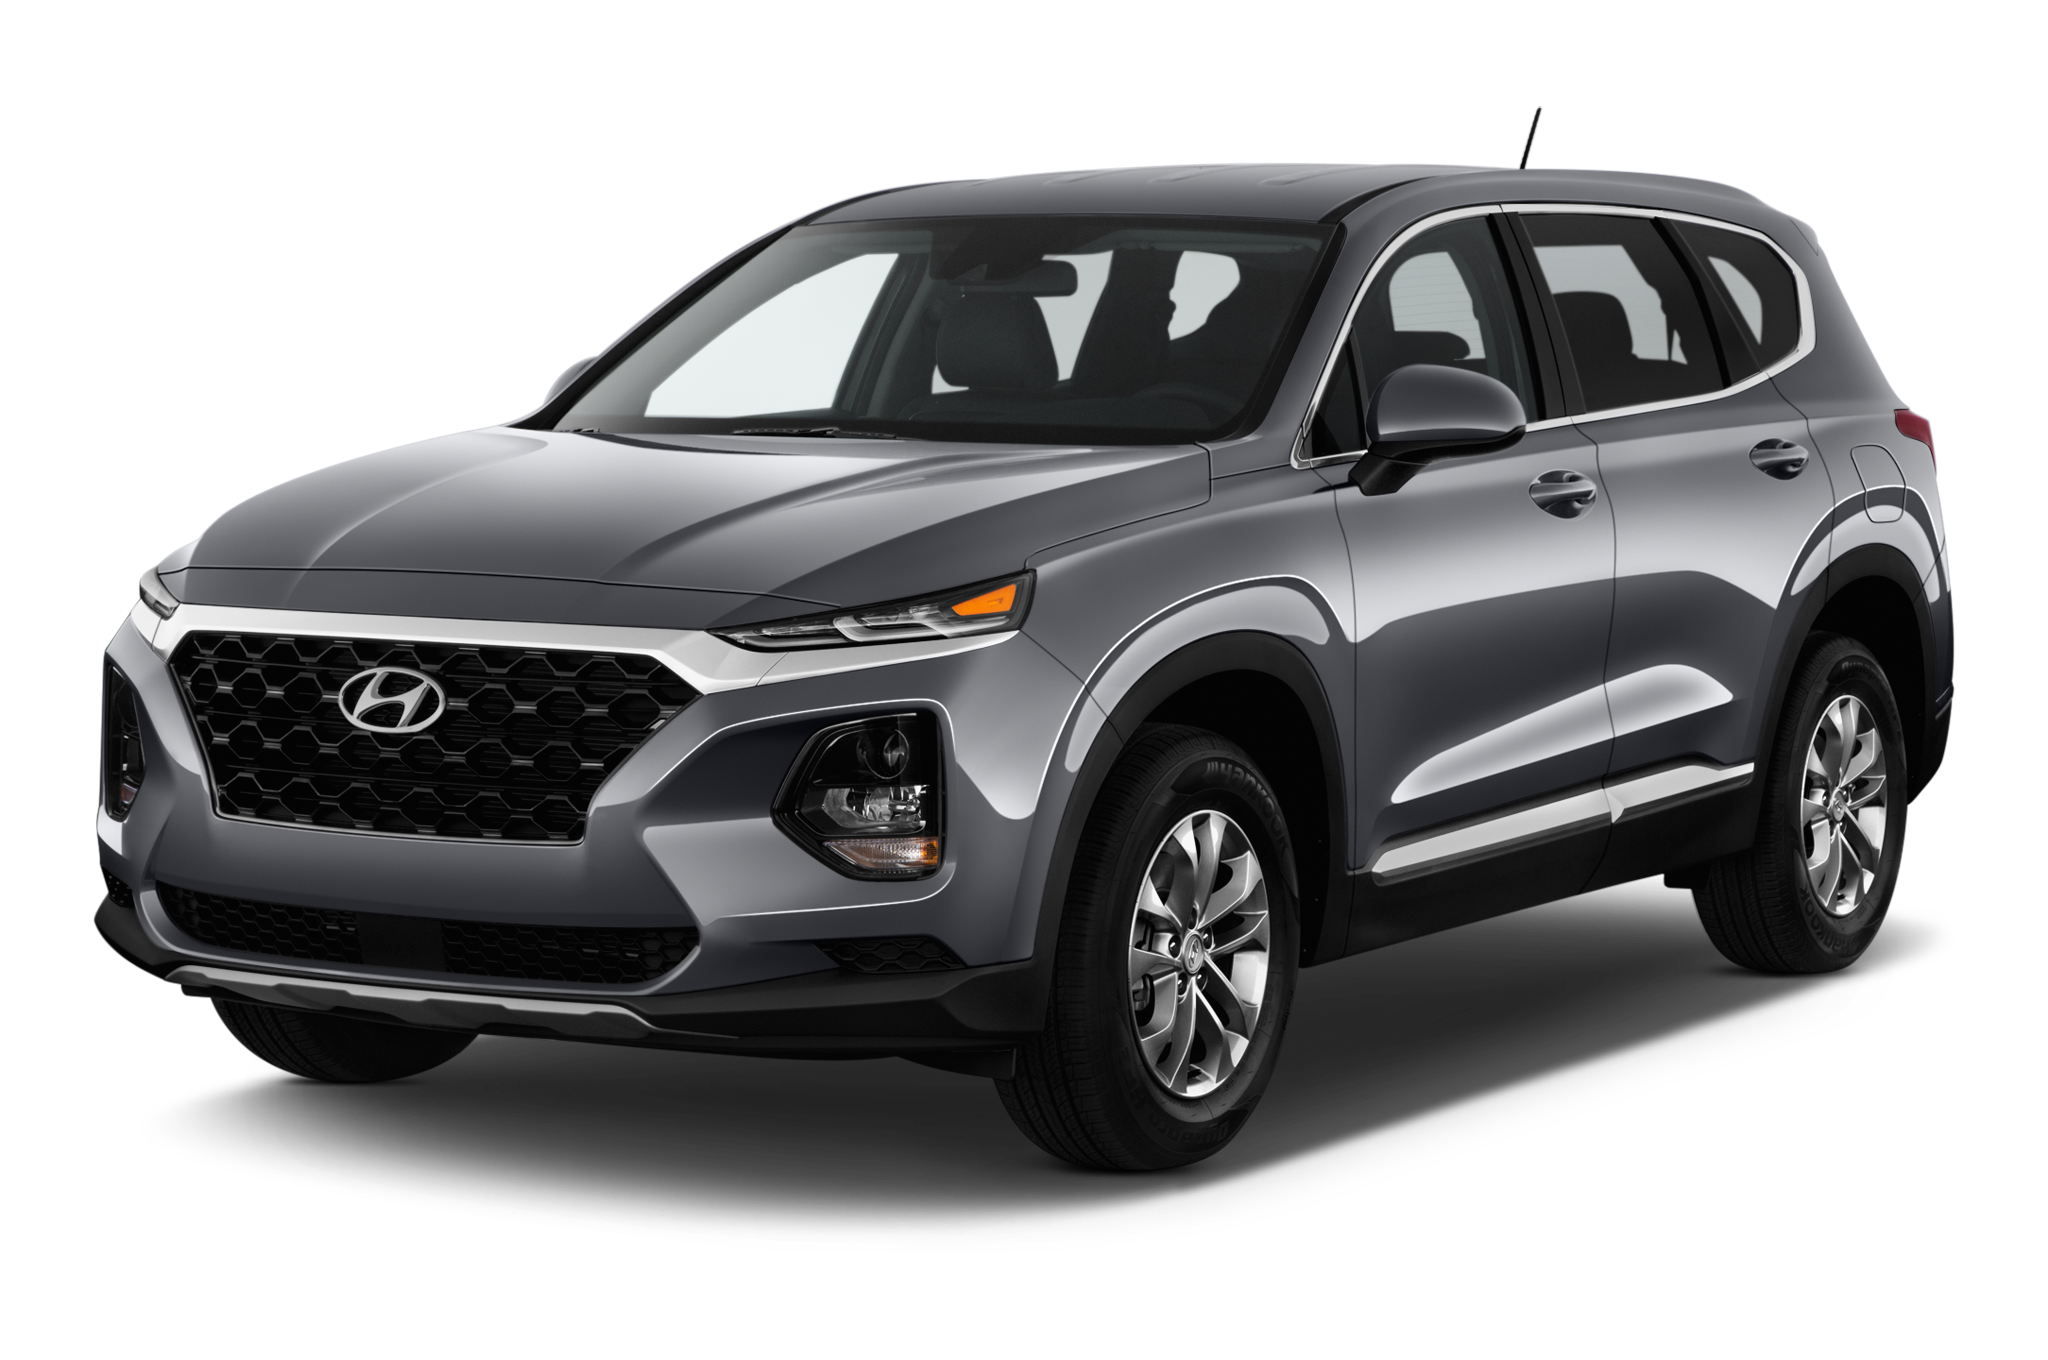 2019 Hyundai Santa Fe Overview - MSN Autos